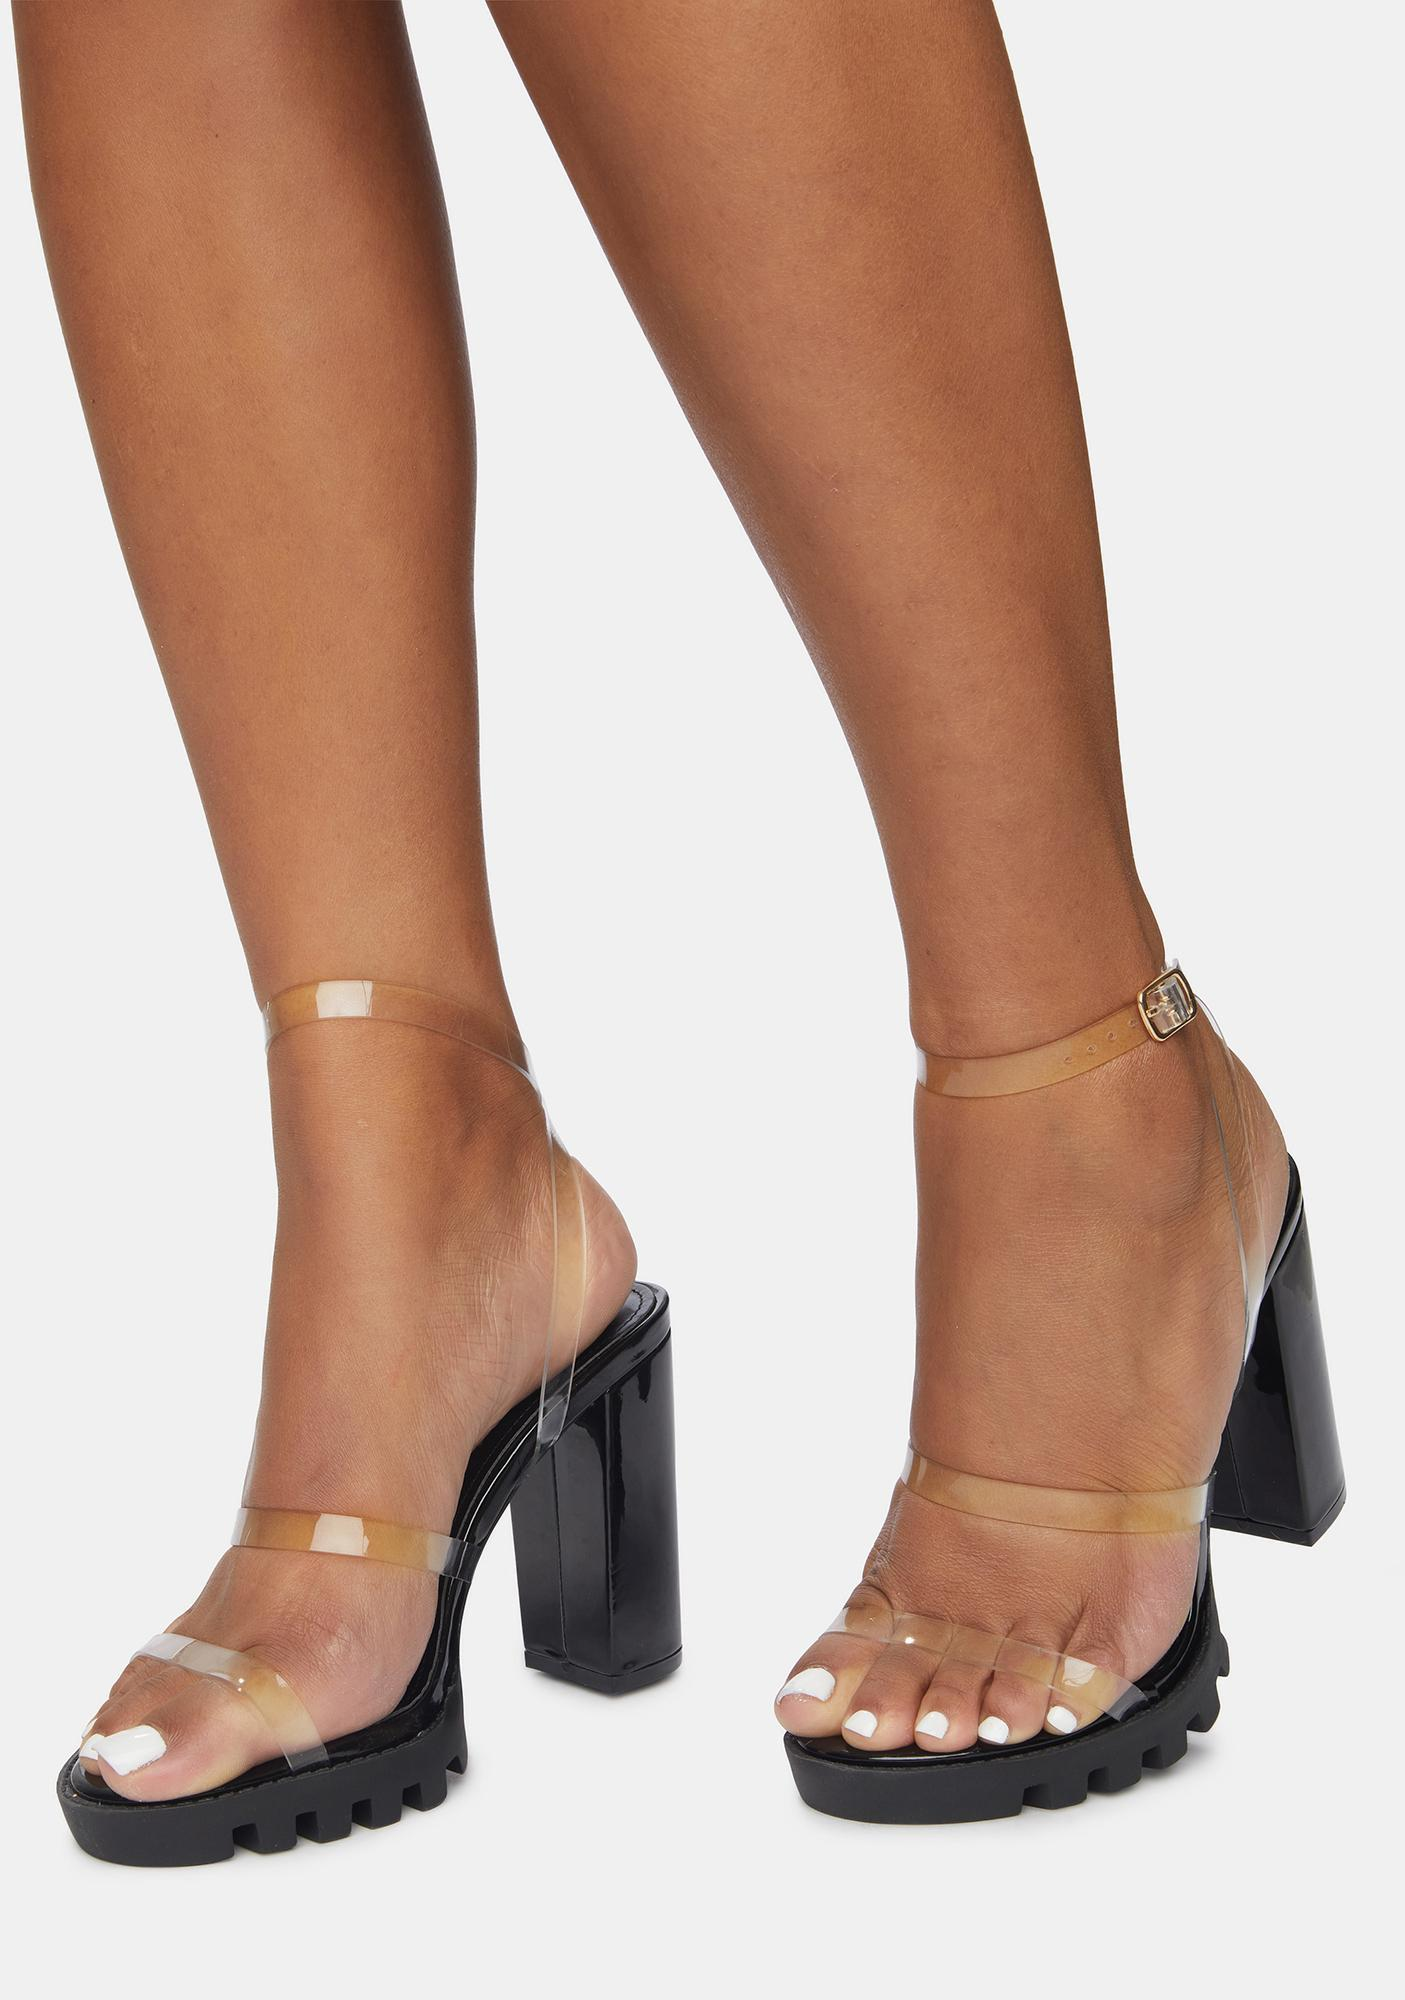 Clear Dream City Iridescent Heels